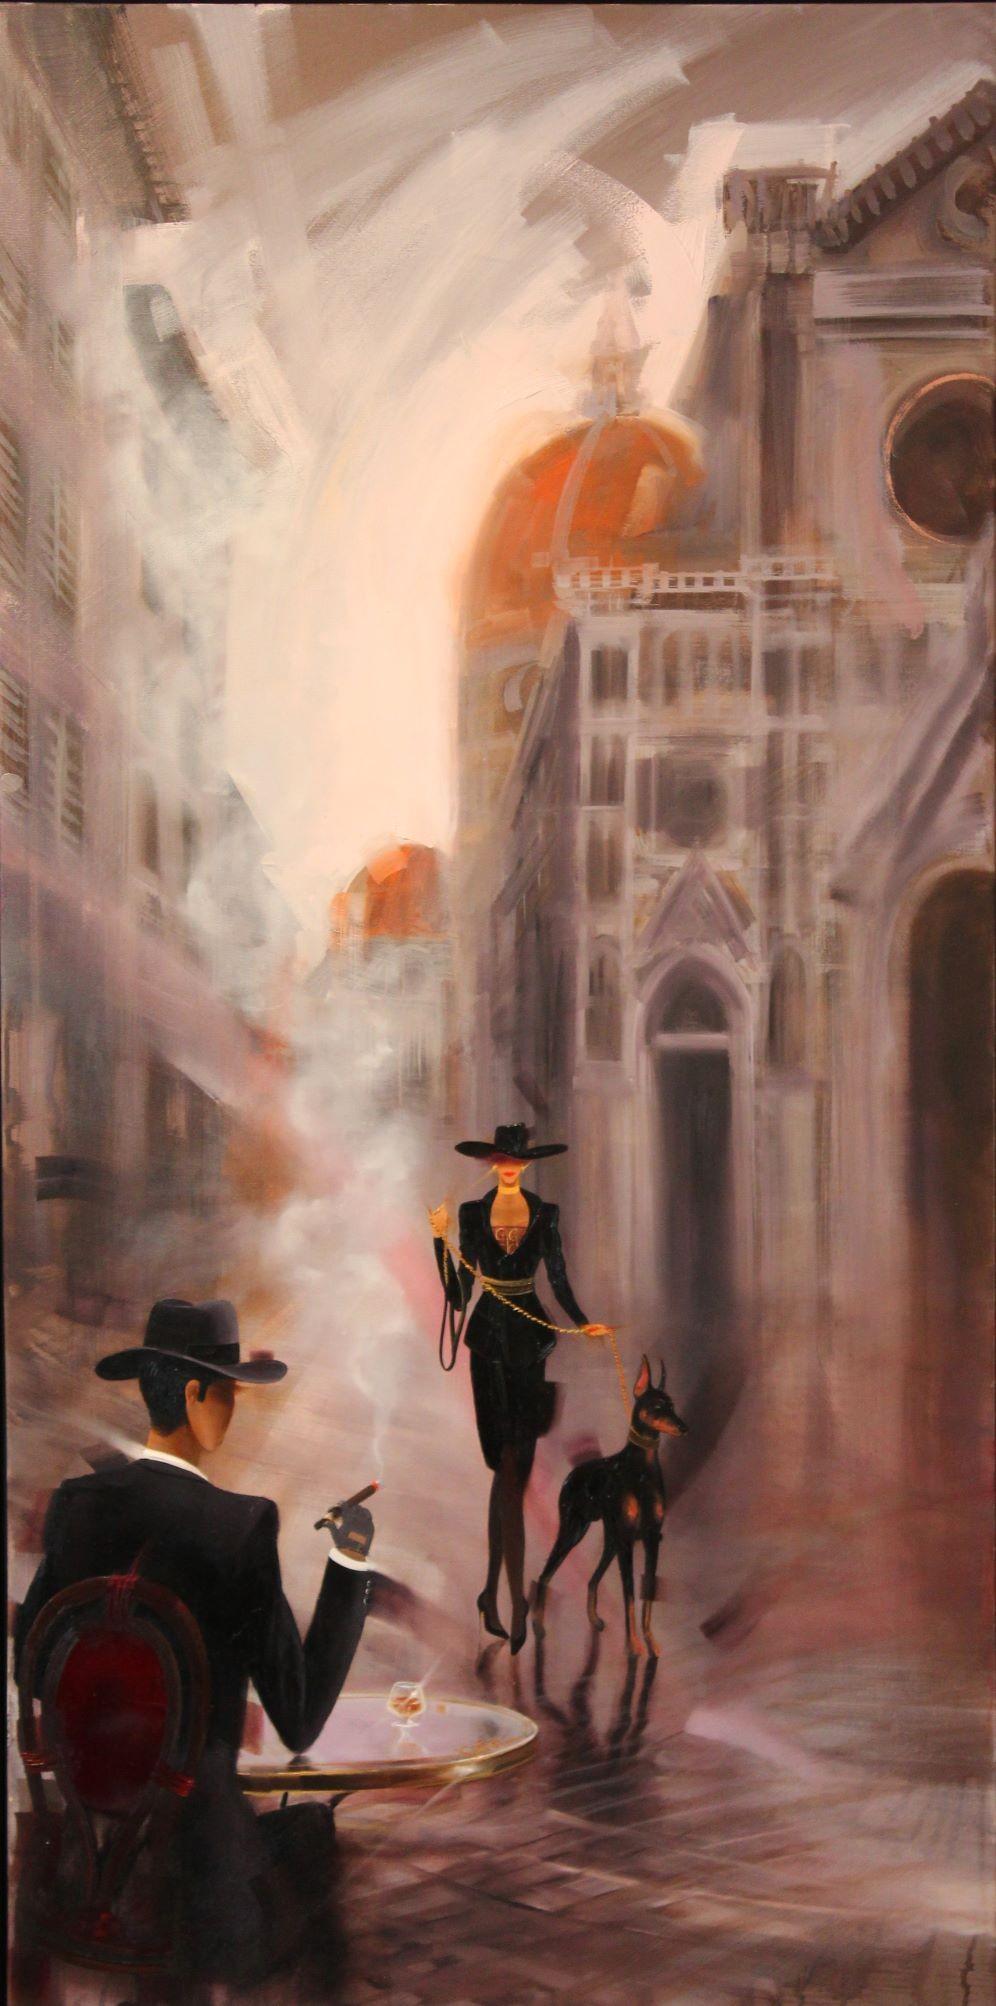 Kamiar Gajoum Firenze Original Oil Painting 48x24